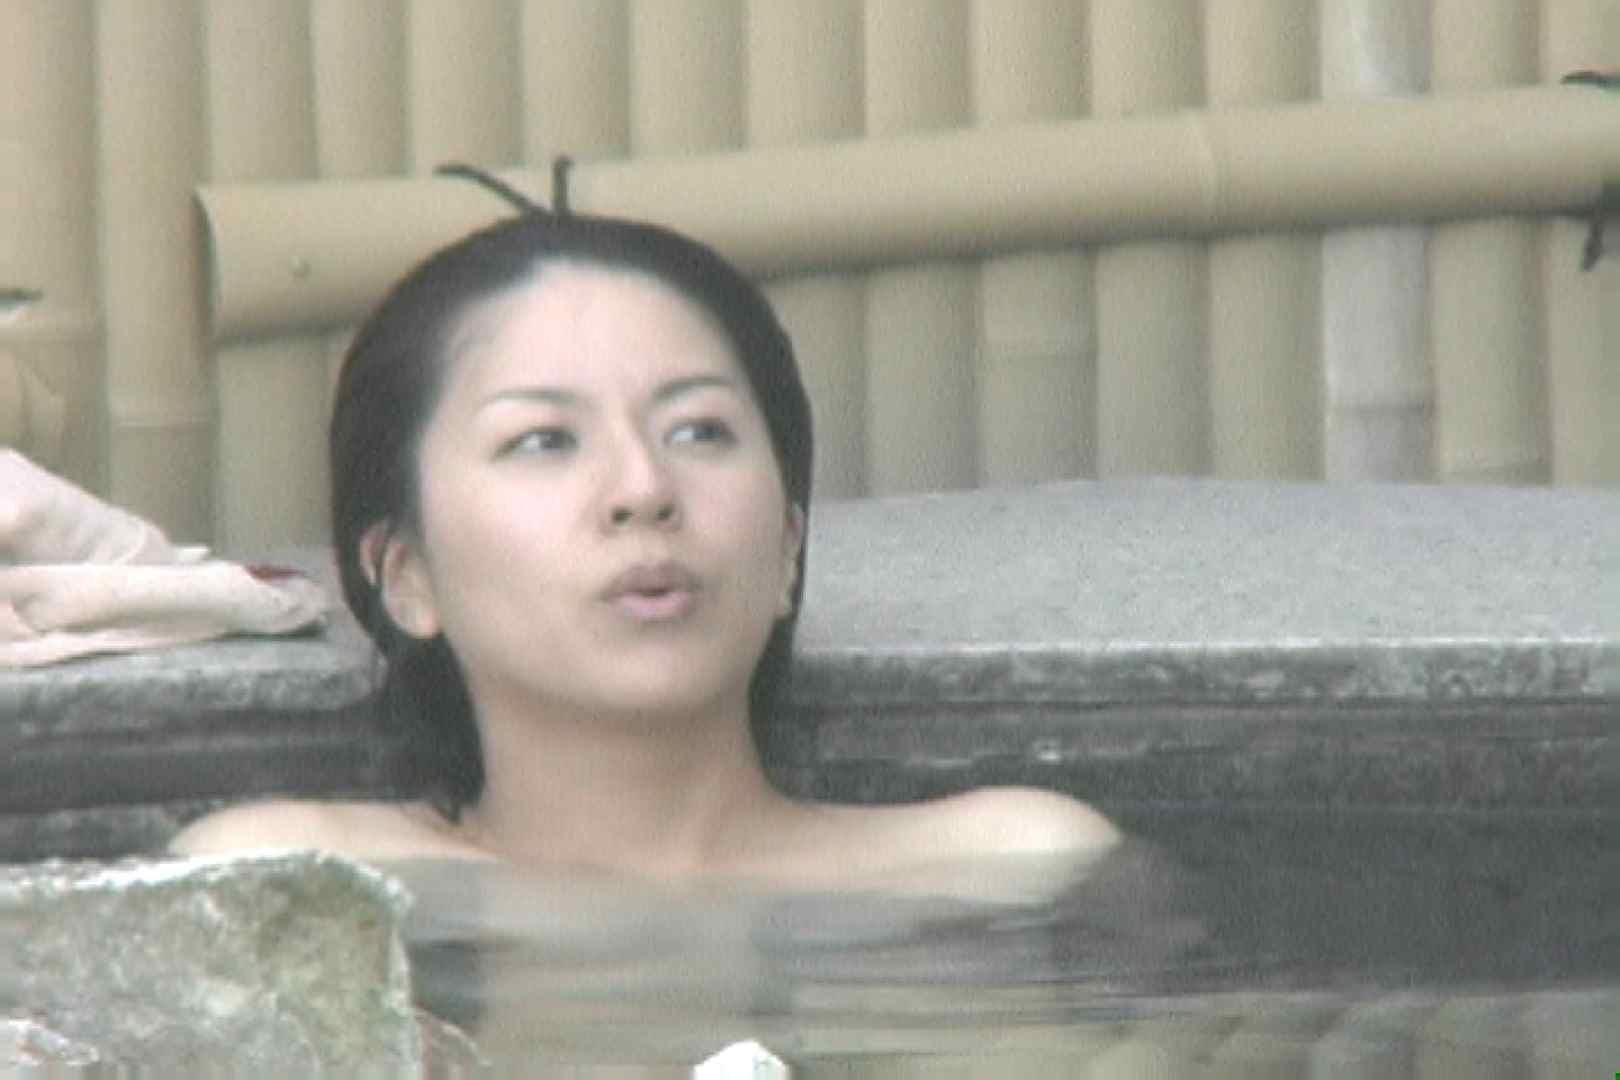 Aquaな露天風呂Vol.694 露天 オメコ無修正動画無料 110PICs 44